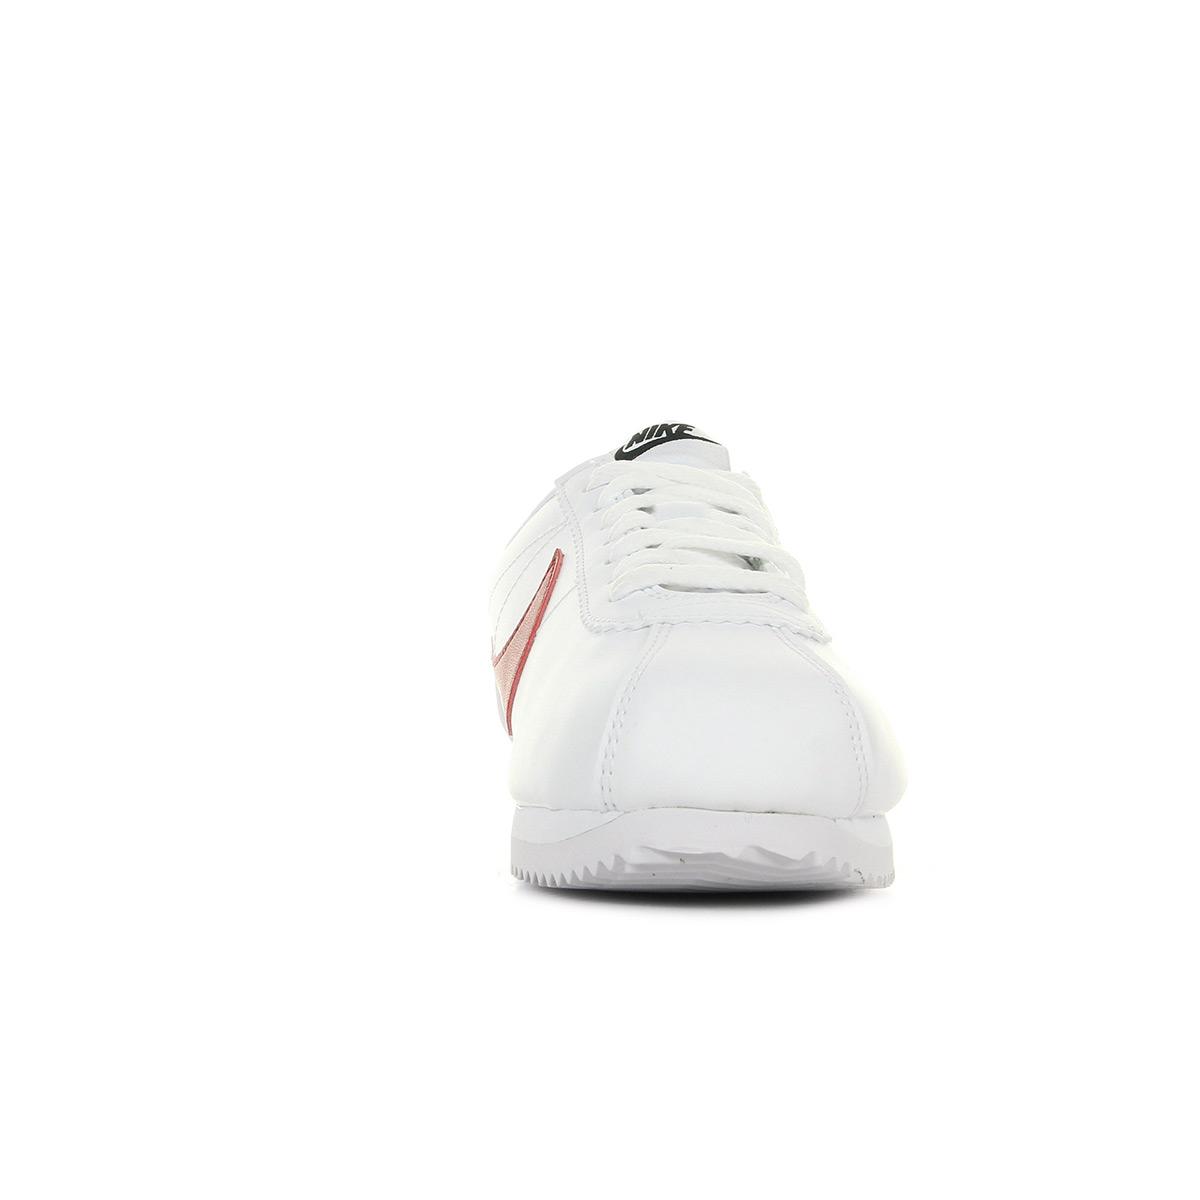 Nike Classic Cortez Leather 807471103, Baskets mode femme